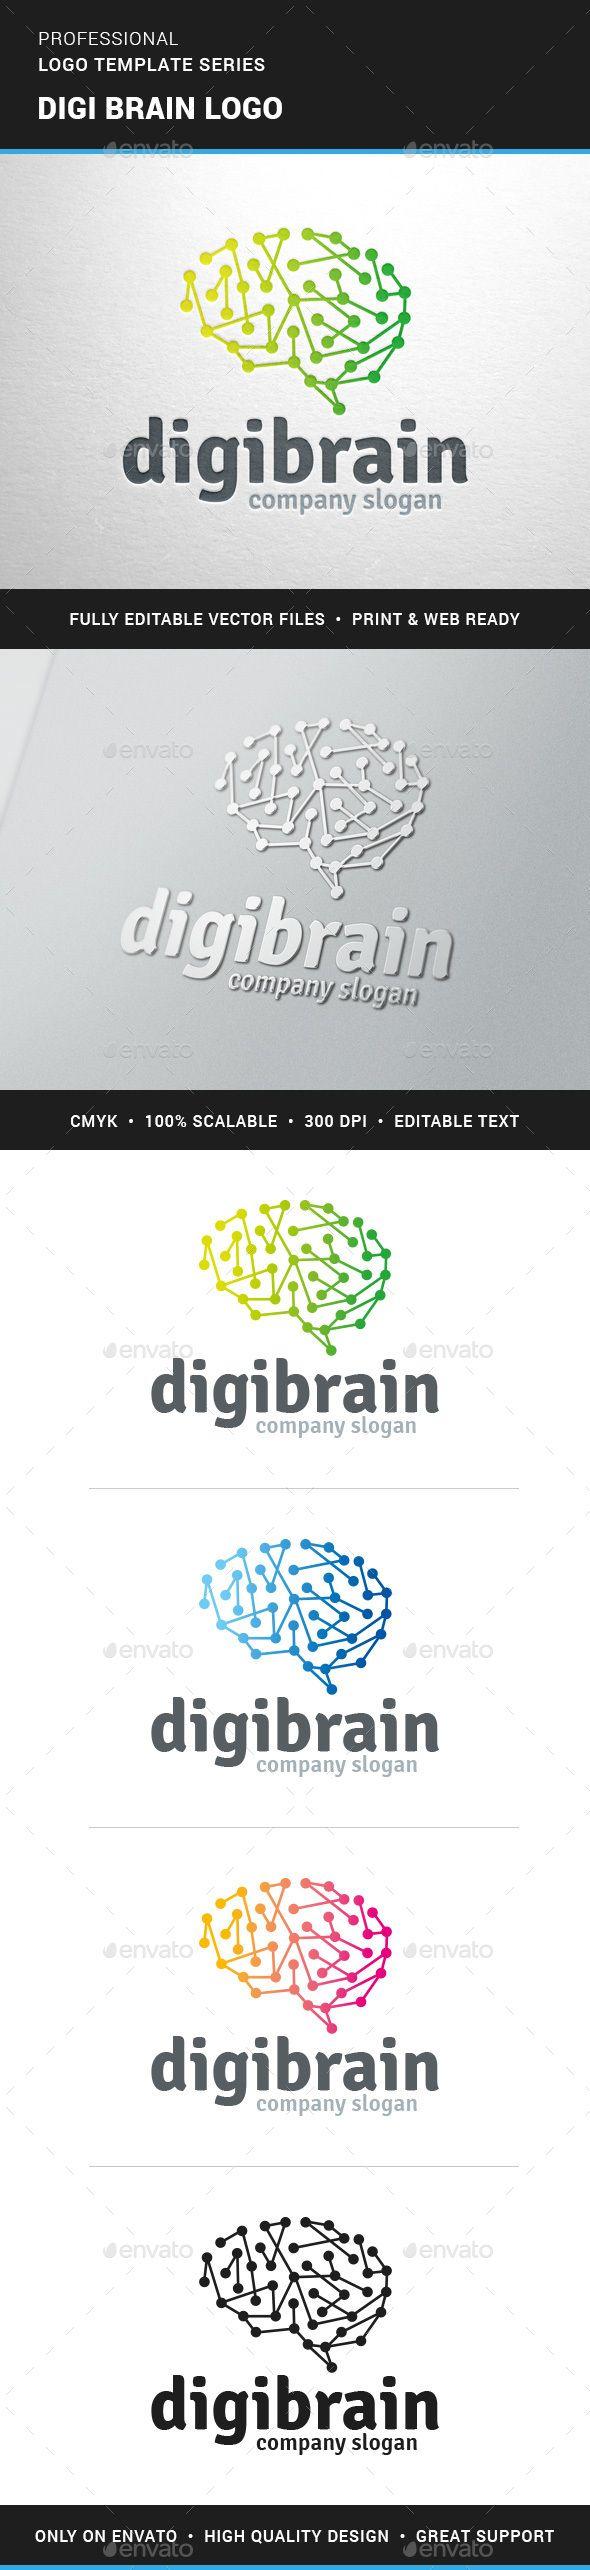 Digi Brain   Logo Design Template Vector #logotype Download it here: http://graphicriver.net/item/digi-brain-logo-template/13297211?s_rank=1626?ref=nexion